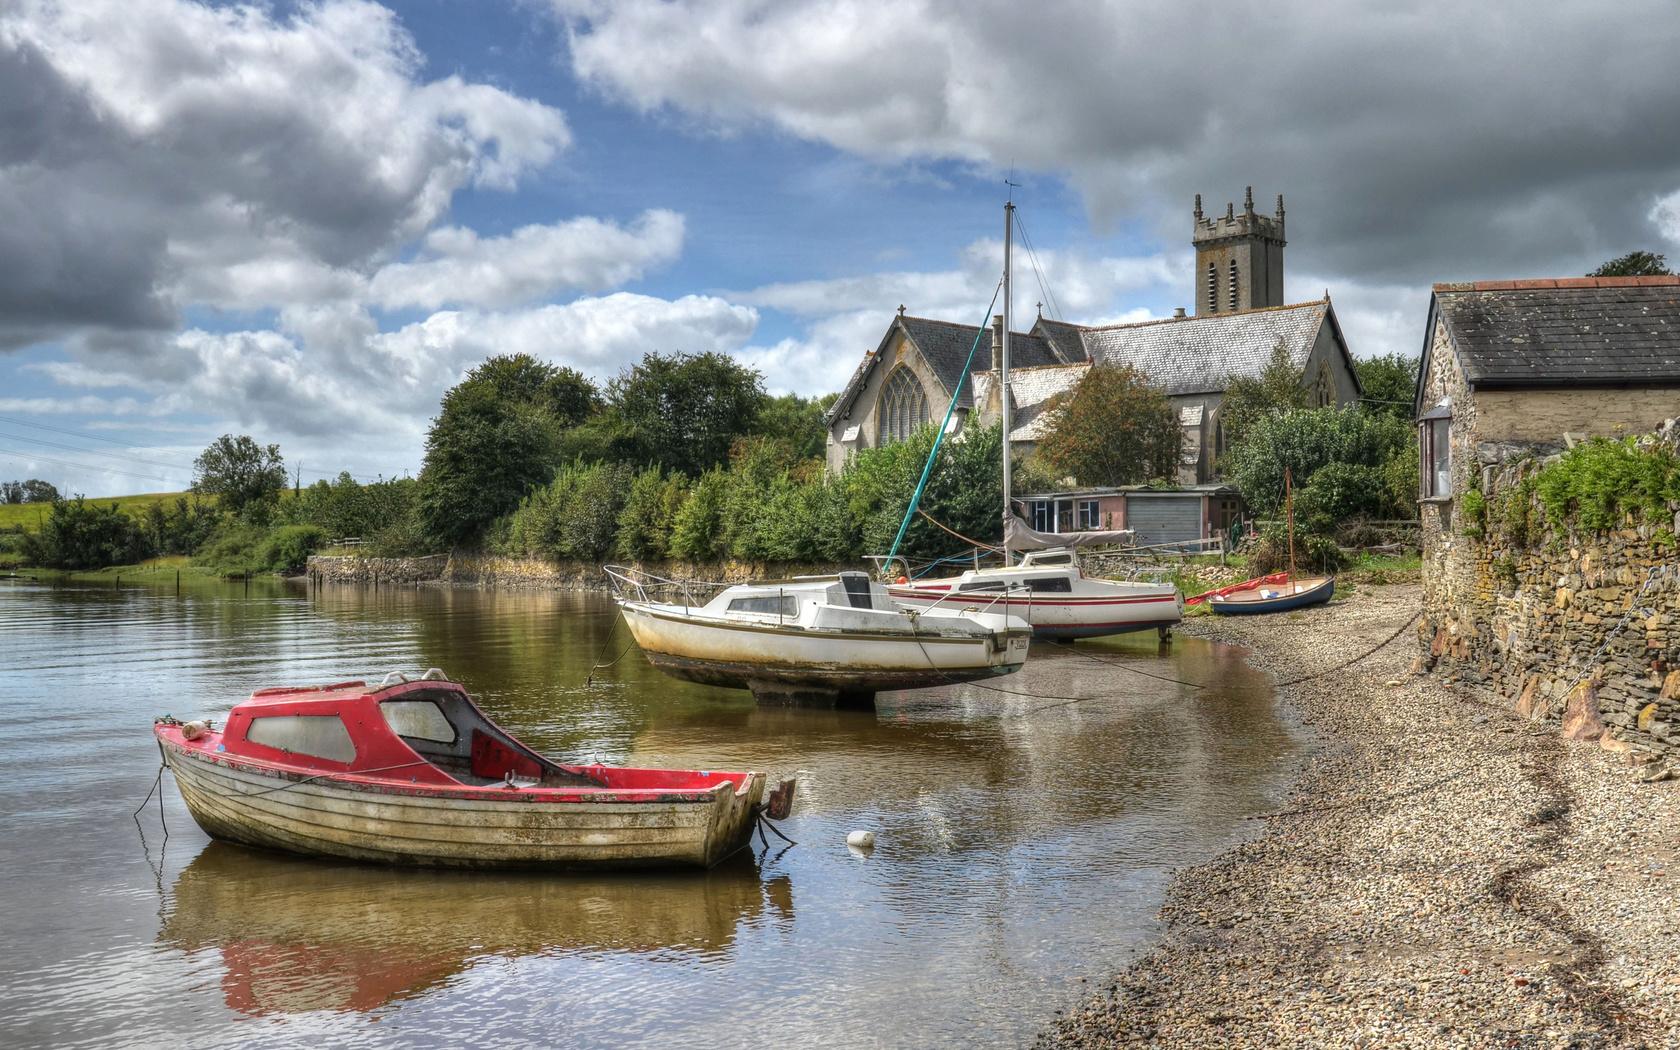 англия, дома, побережье, катера, лодки, river, tavy at bere, ferrers, devon, hdr, природа, город